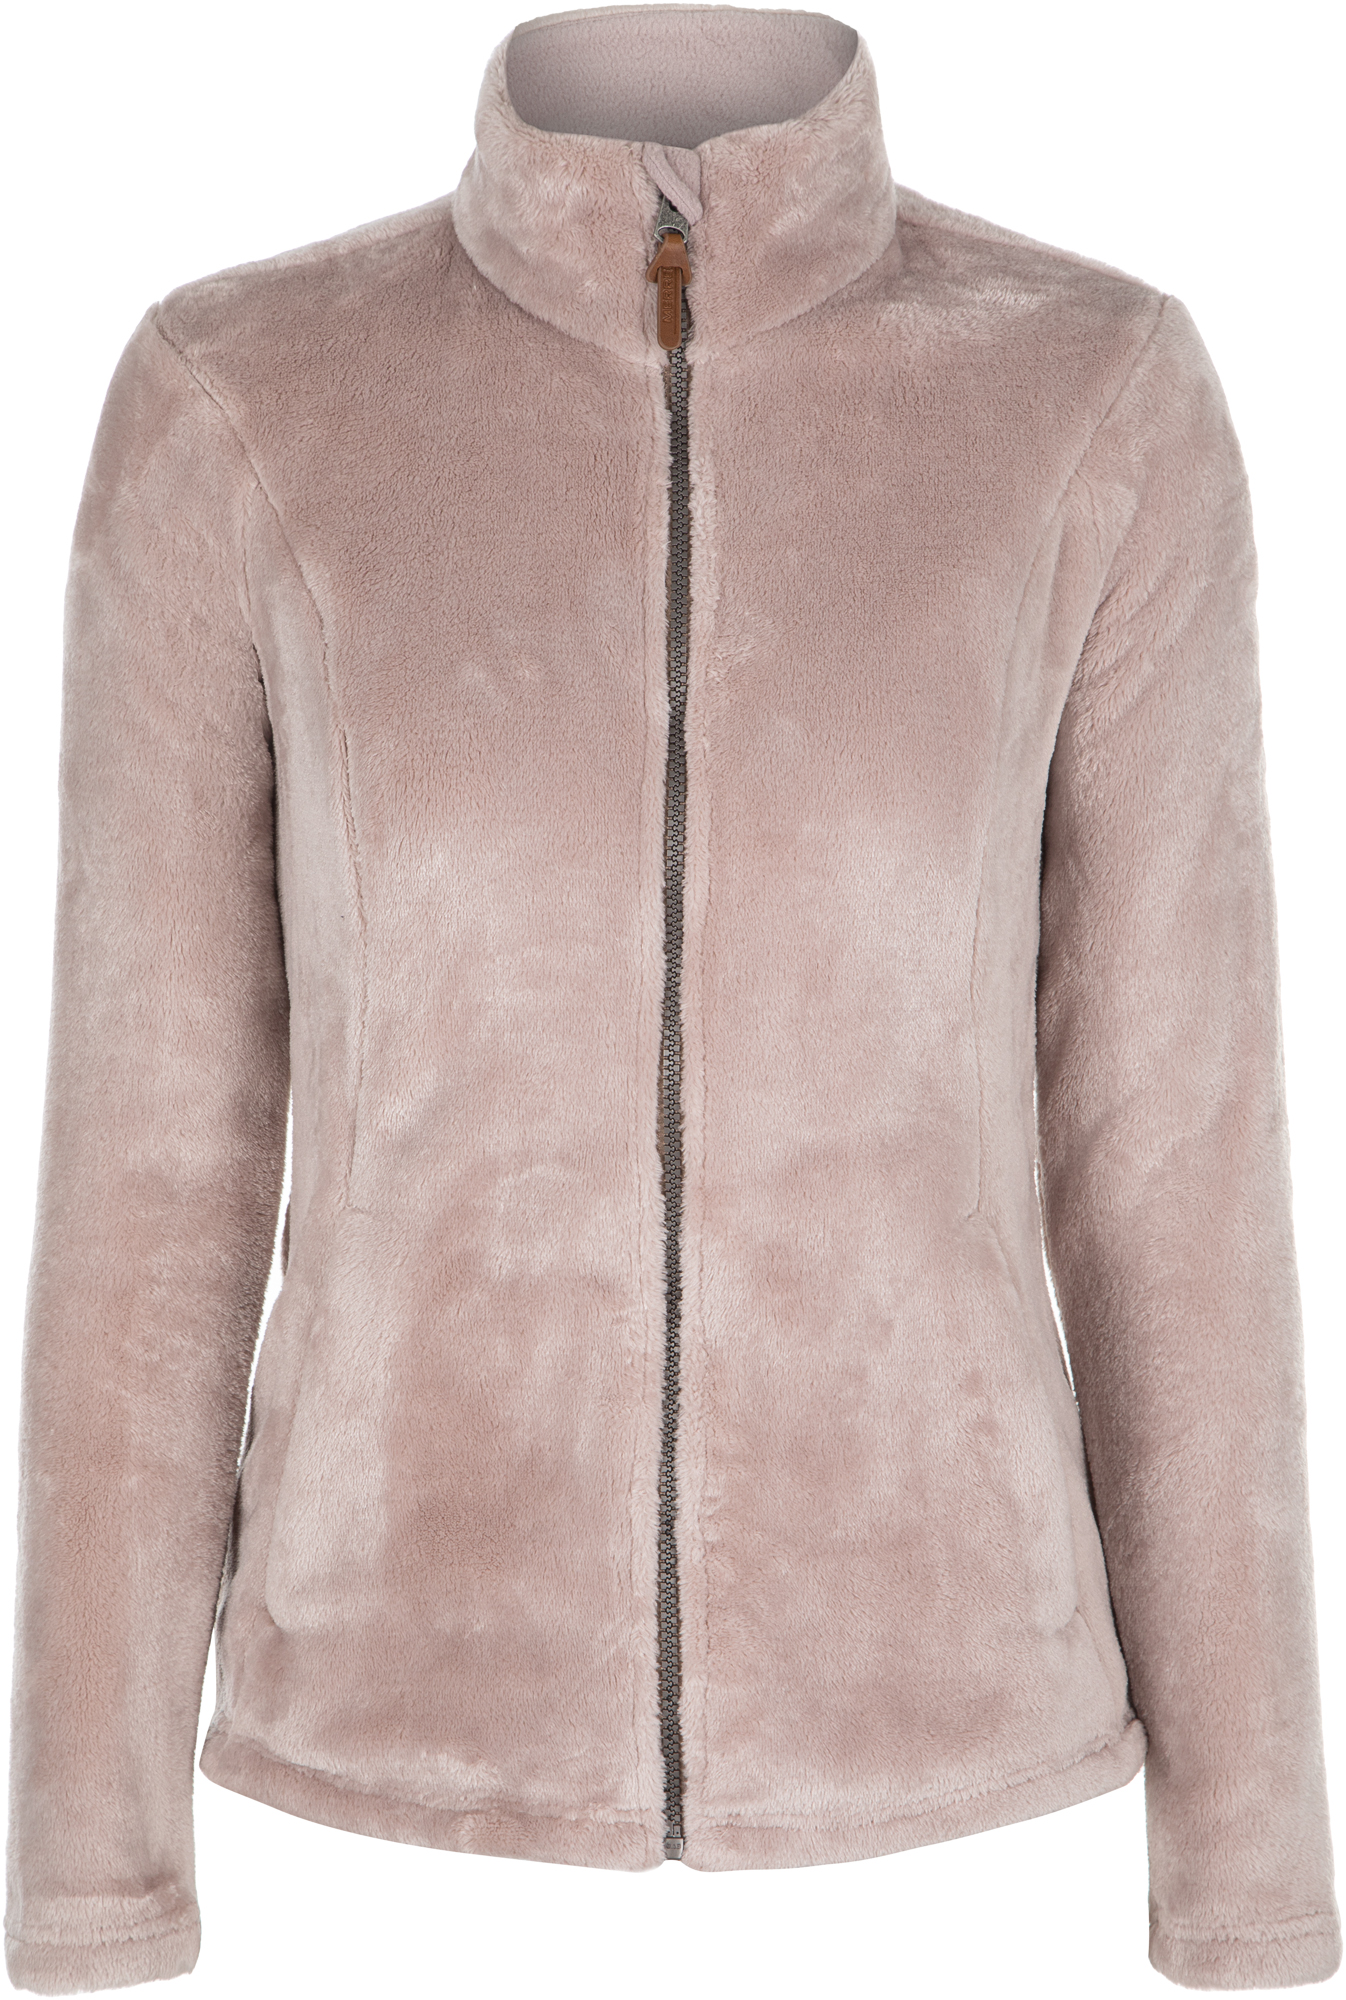 Merrell Джемпер флисовый женский Merrell, размер 44 джемпер женский oodji ultra цвет светло розовый 63812634 48483 4040f размер s 44